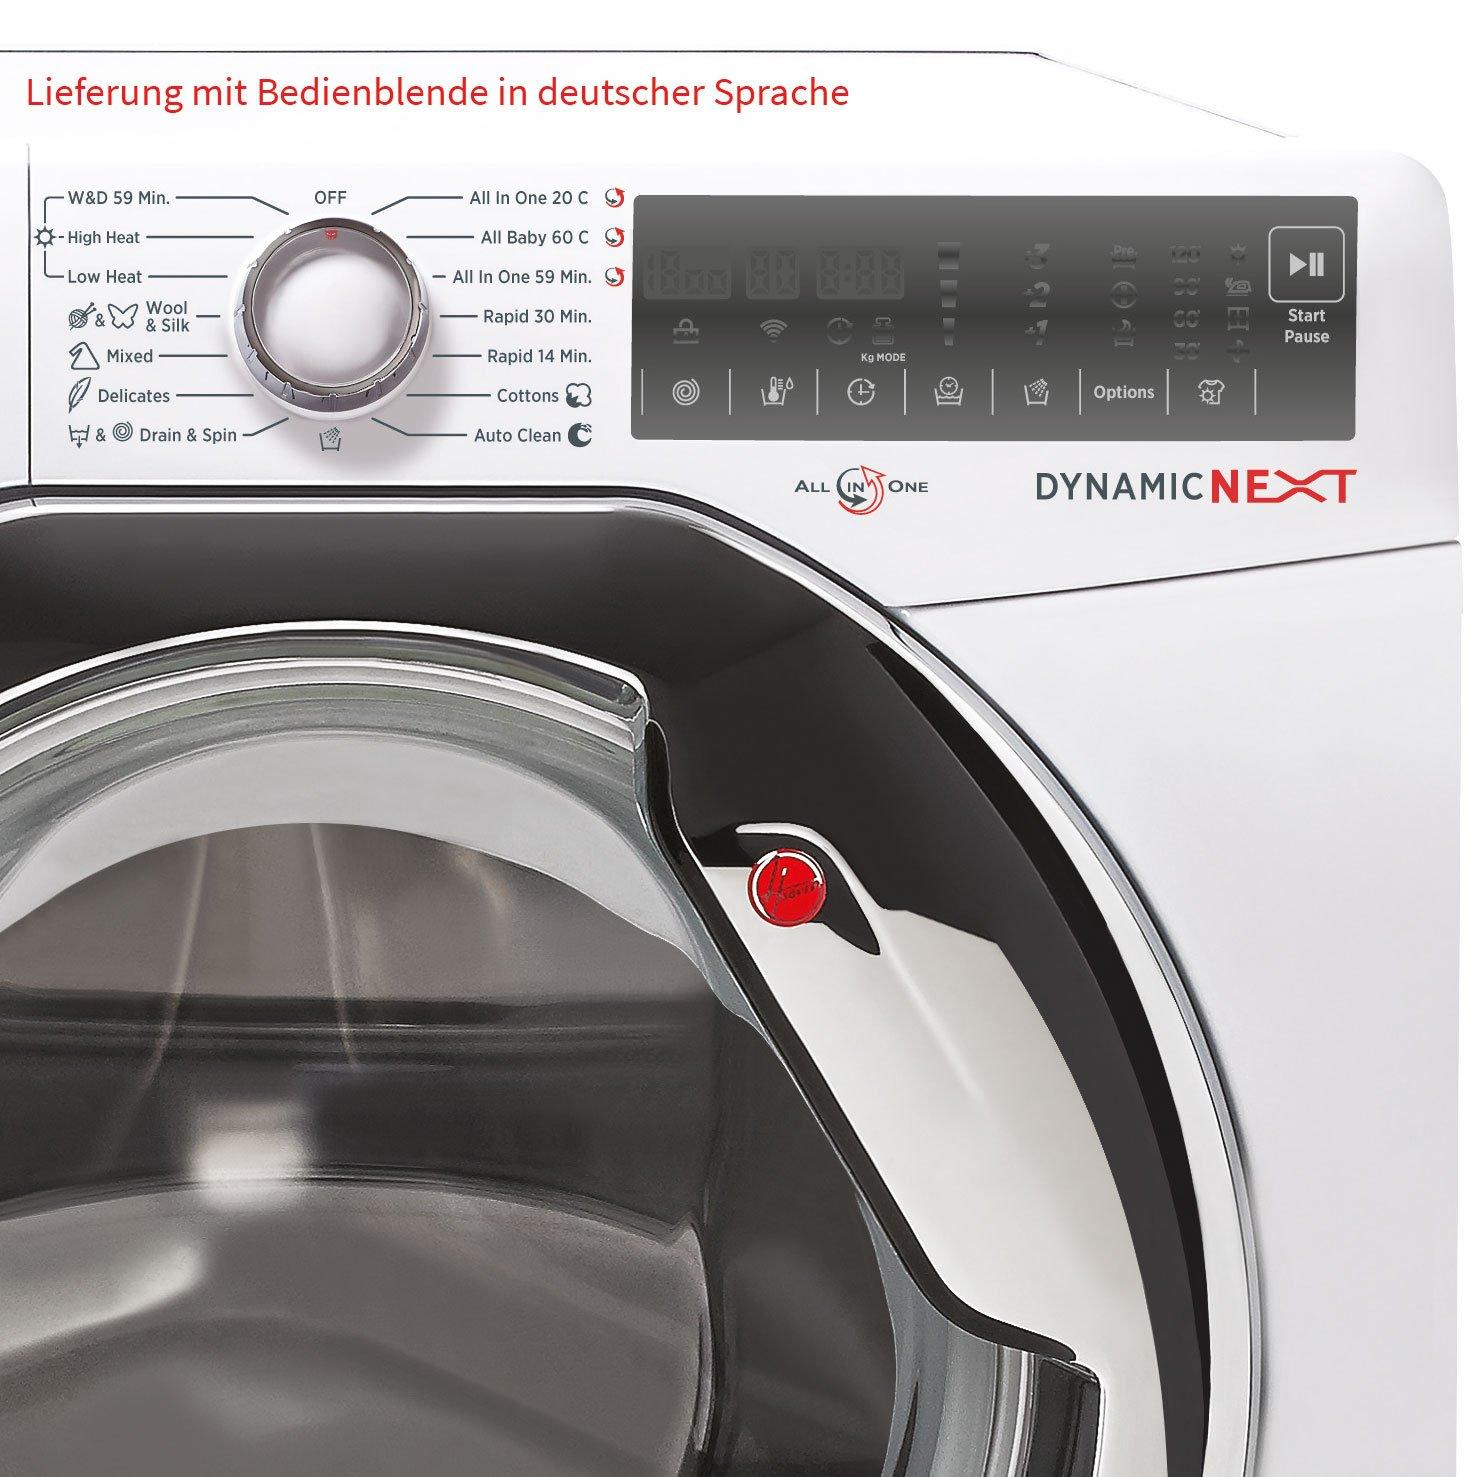 Hoover wdxa 585 a/1 - 84 Blanco wascht rockner 2 en 1, 8 kg lavado ...